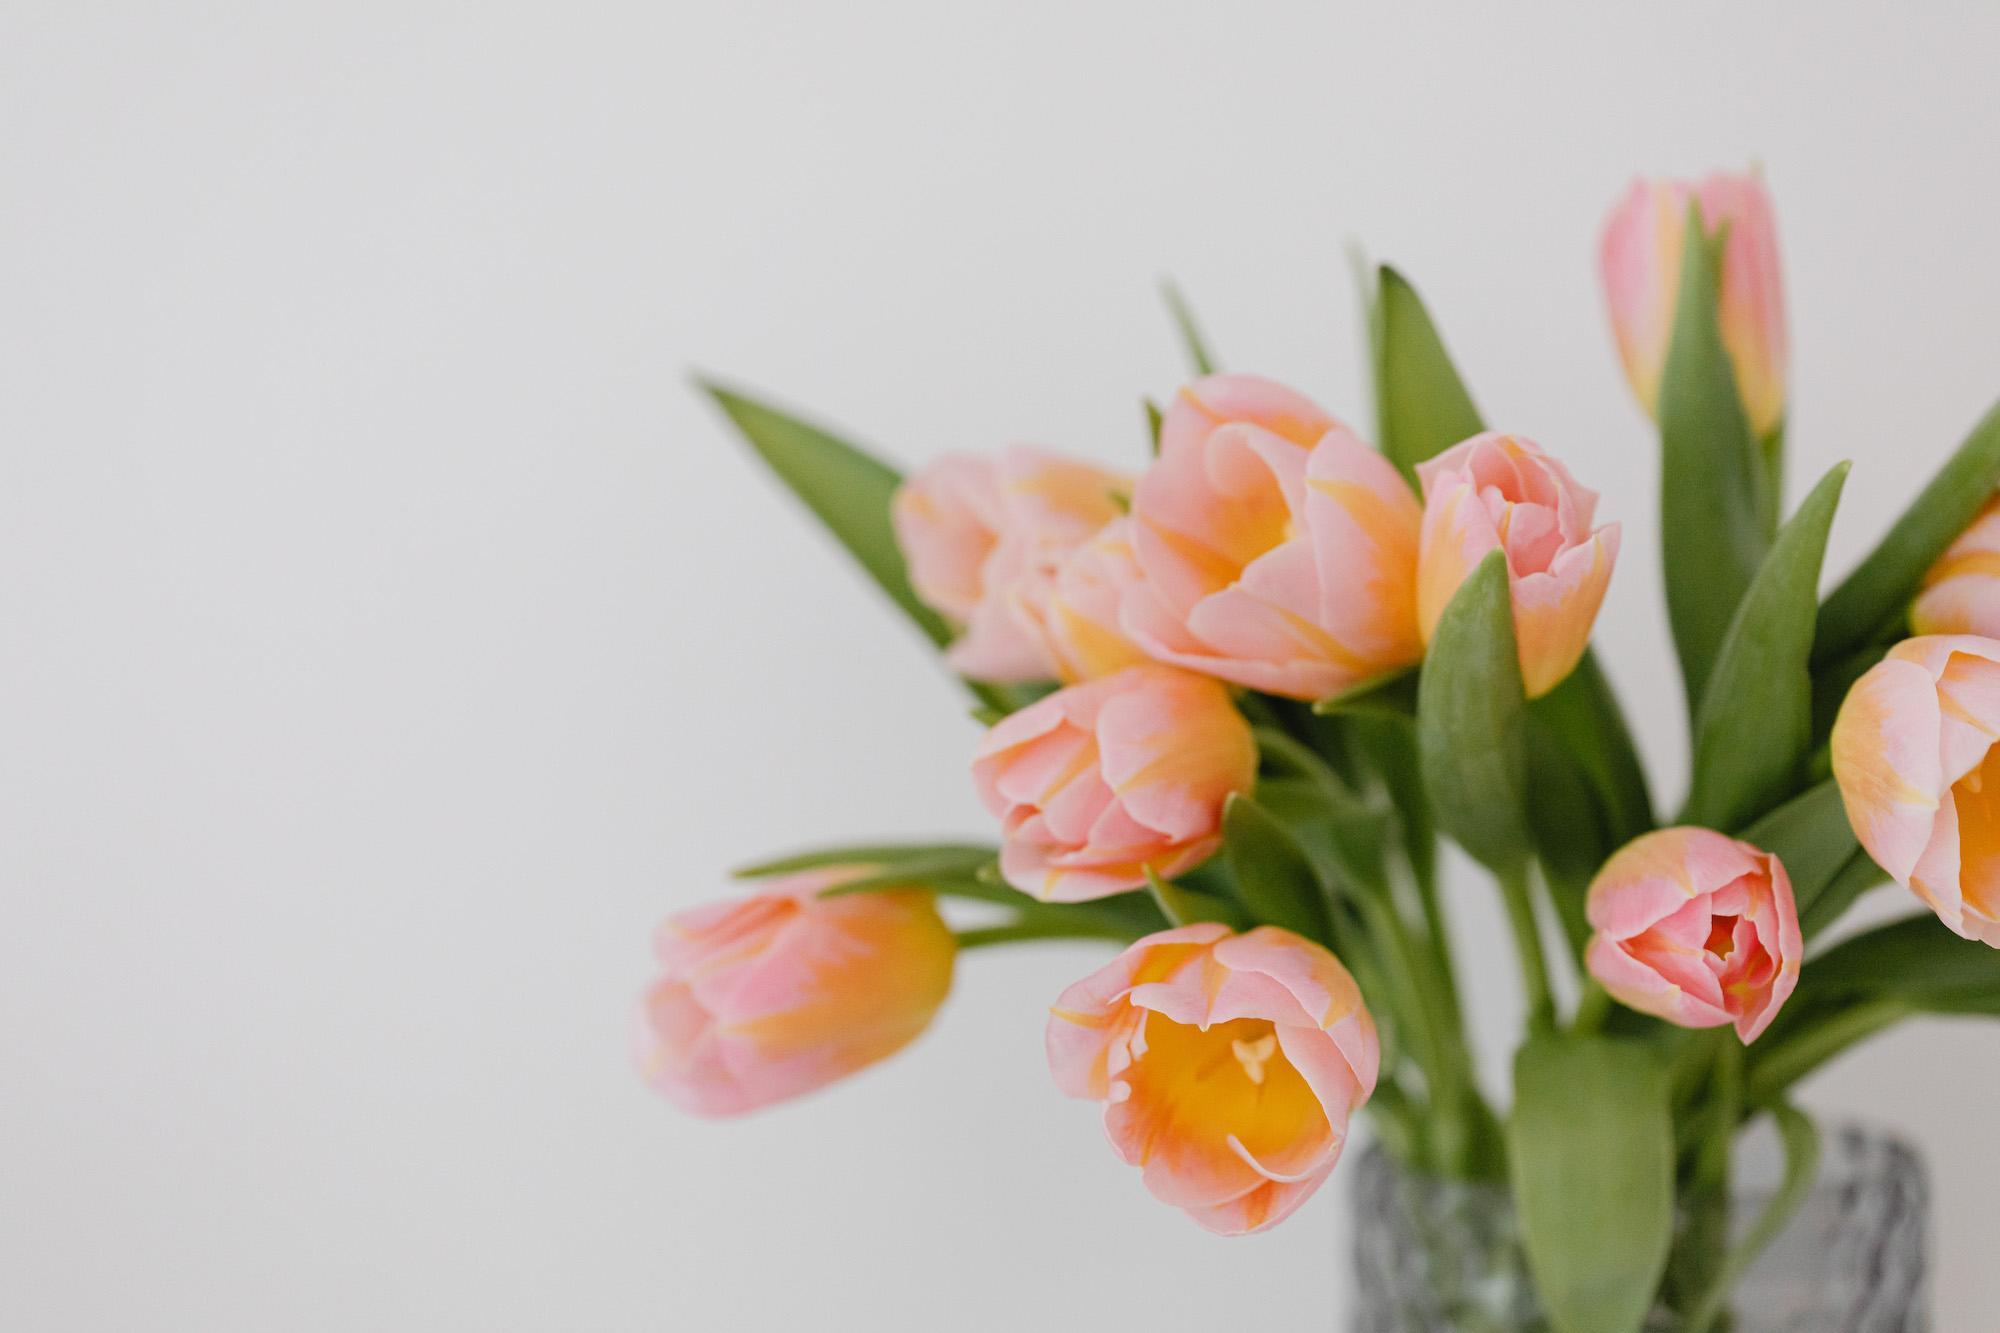 kaboompics_Pink and yellow tulips-4r